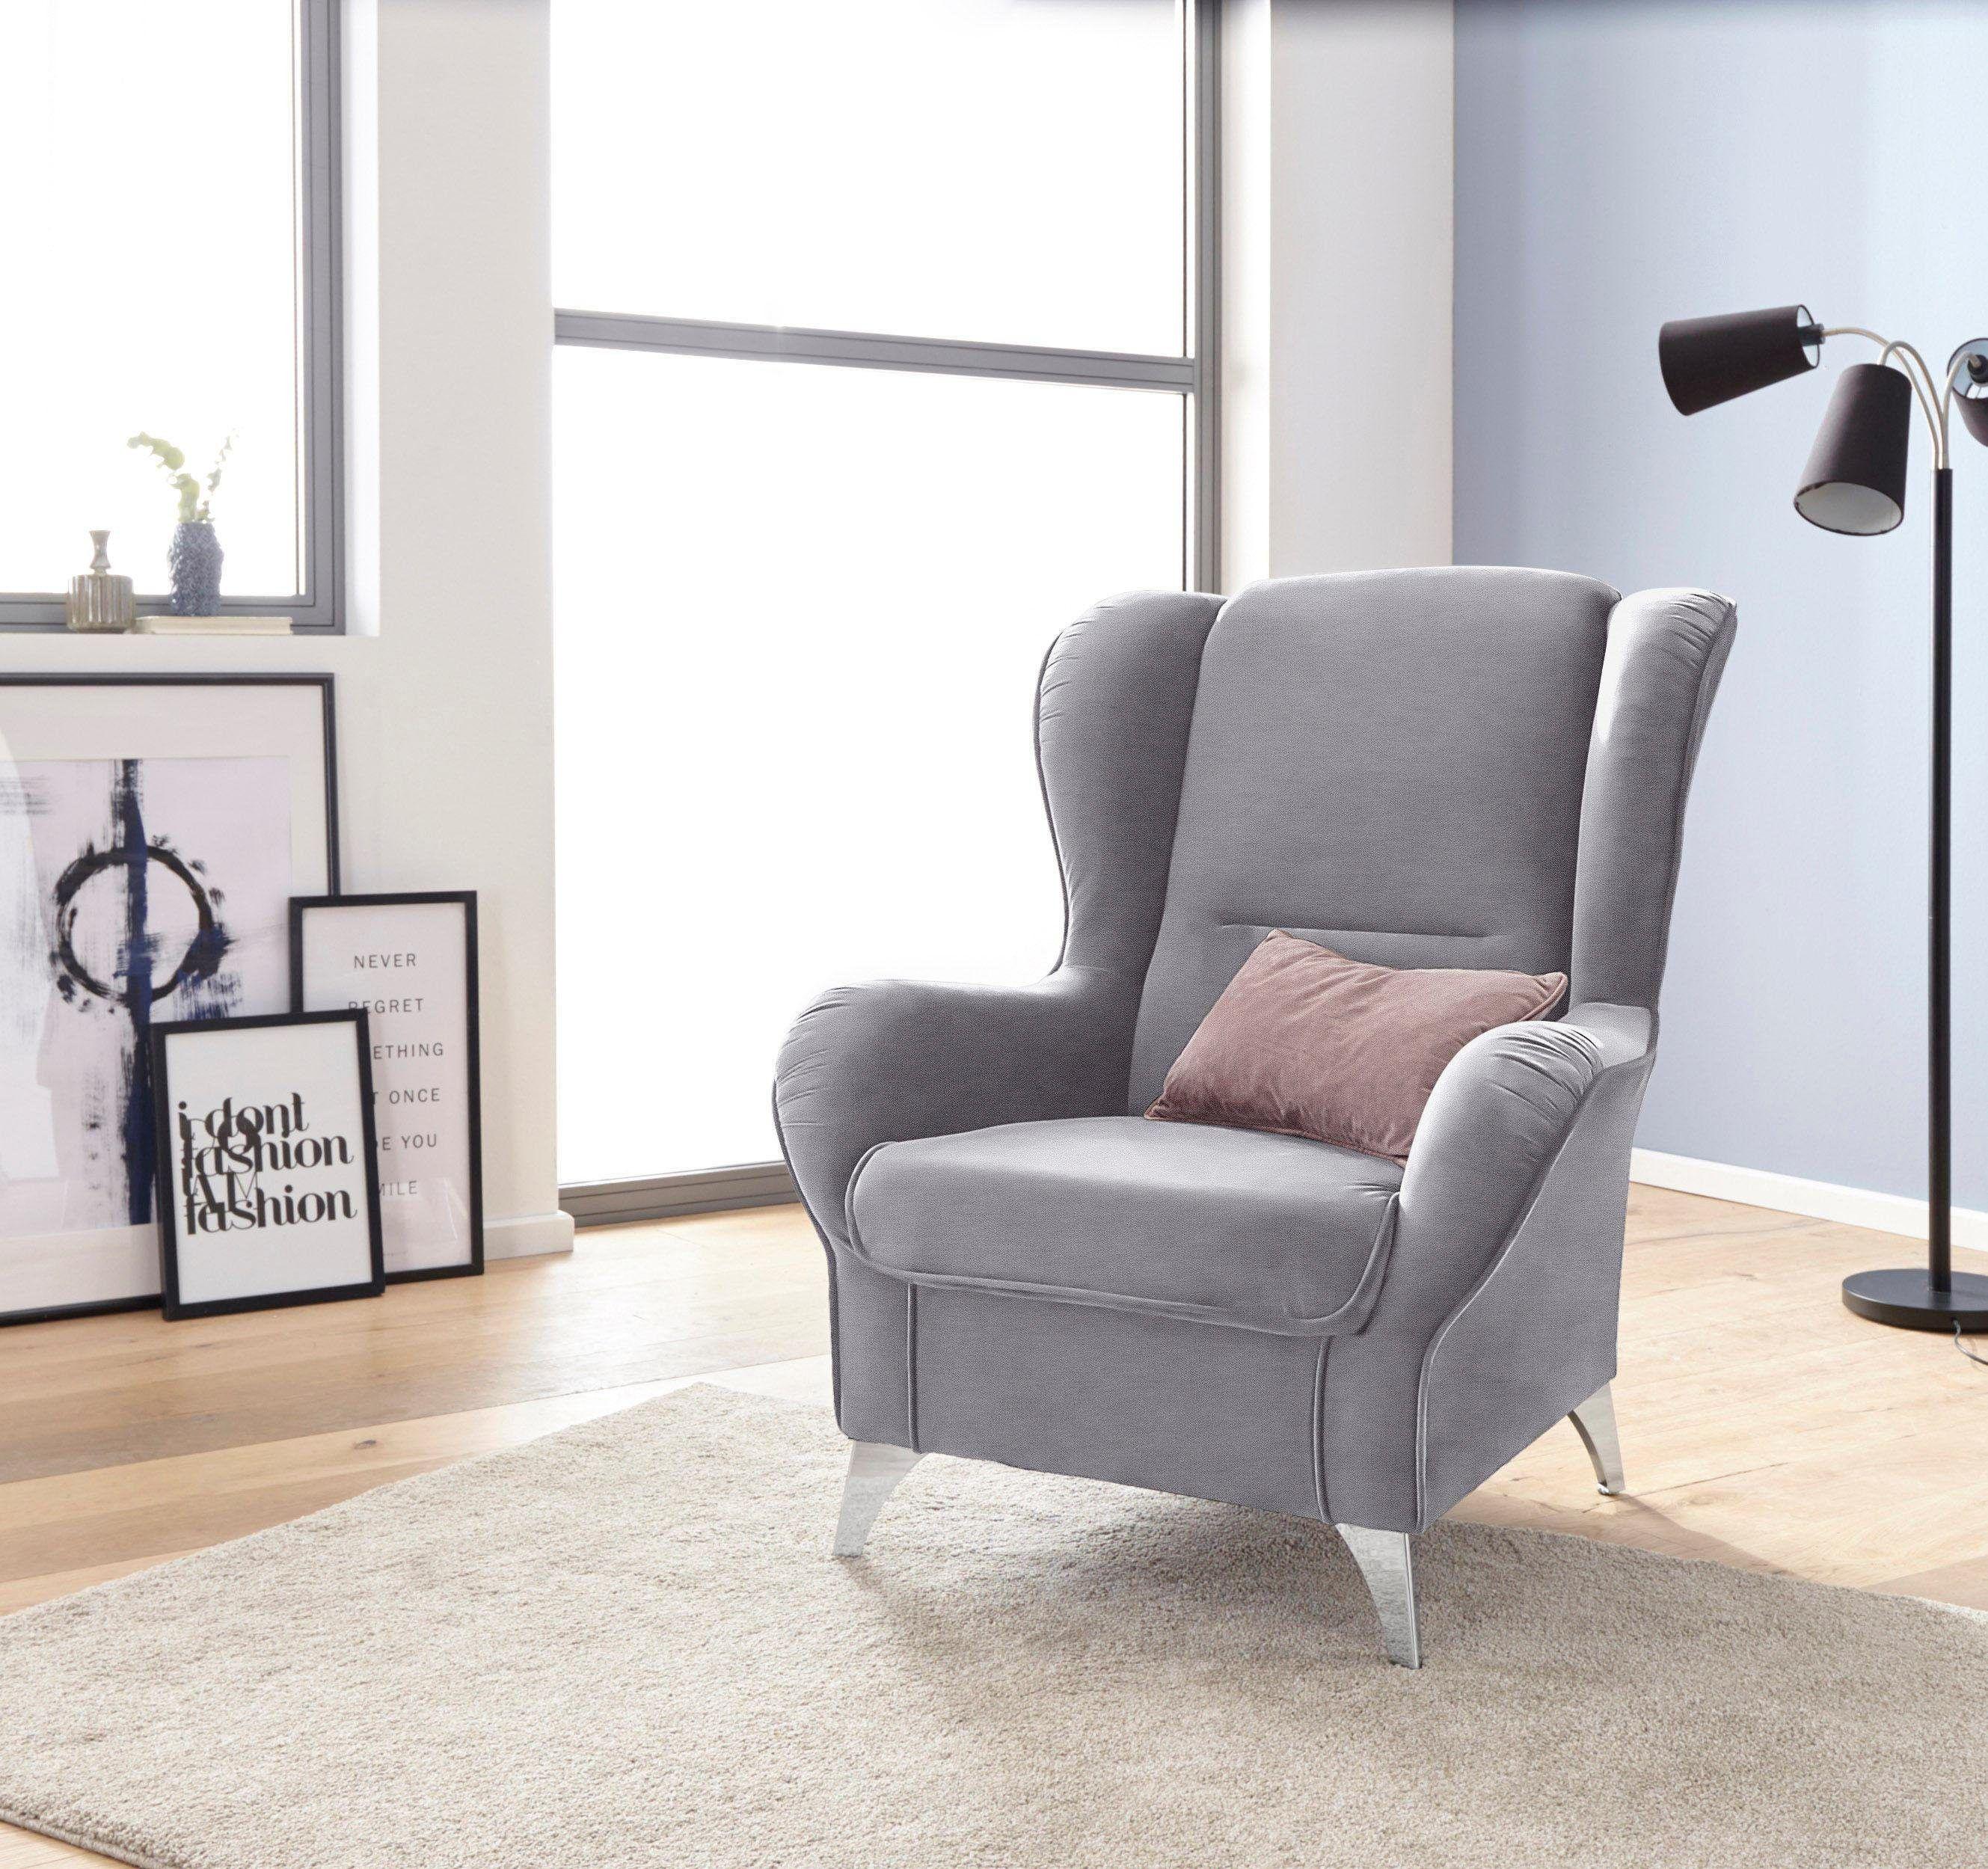 Sessel Weich Designer Lounge Sessel